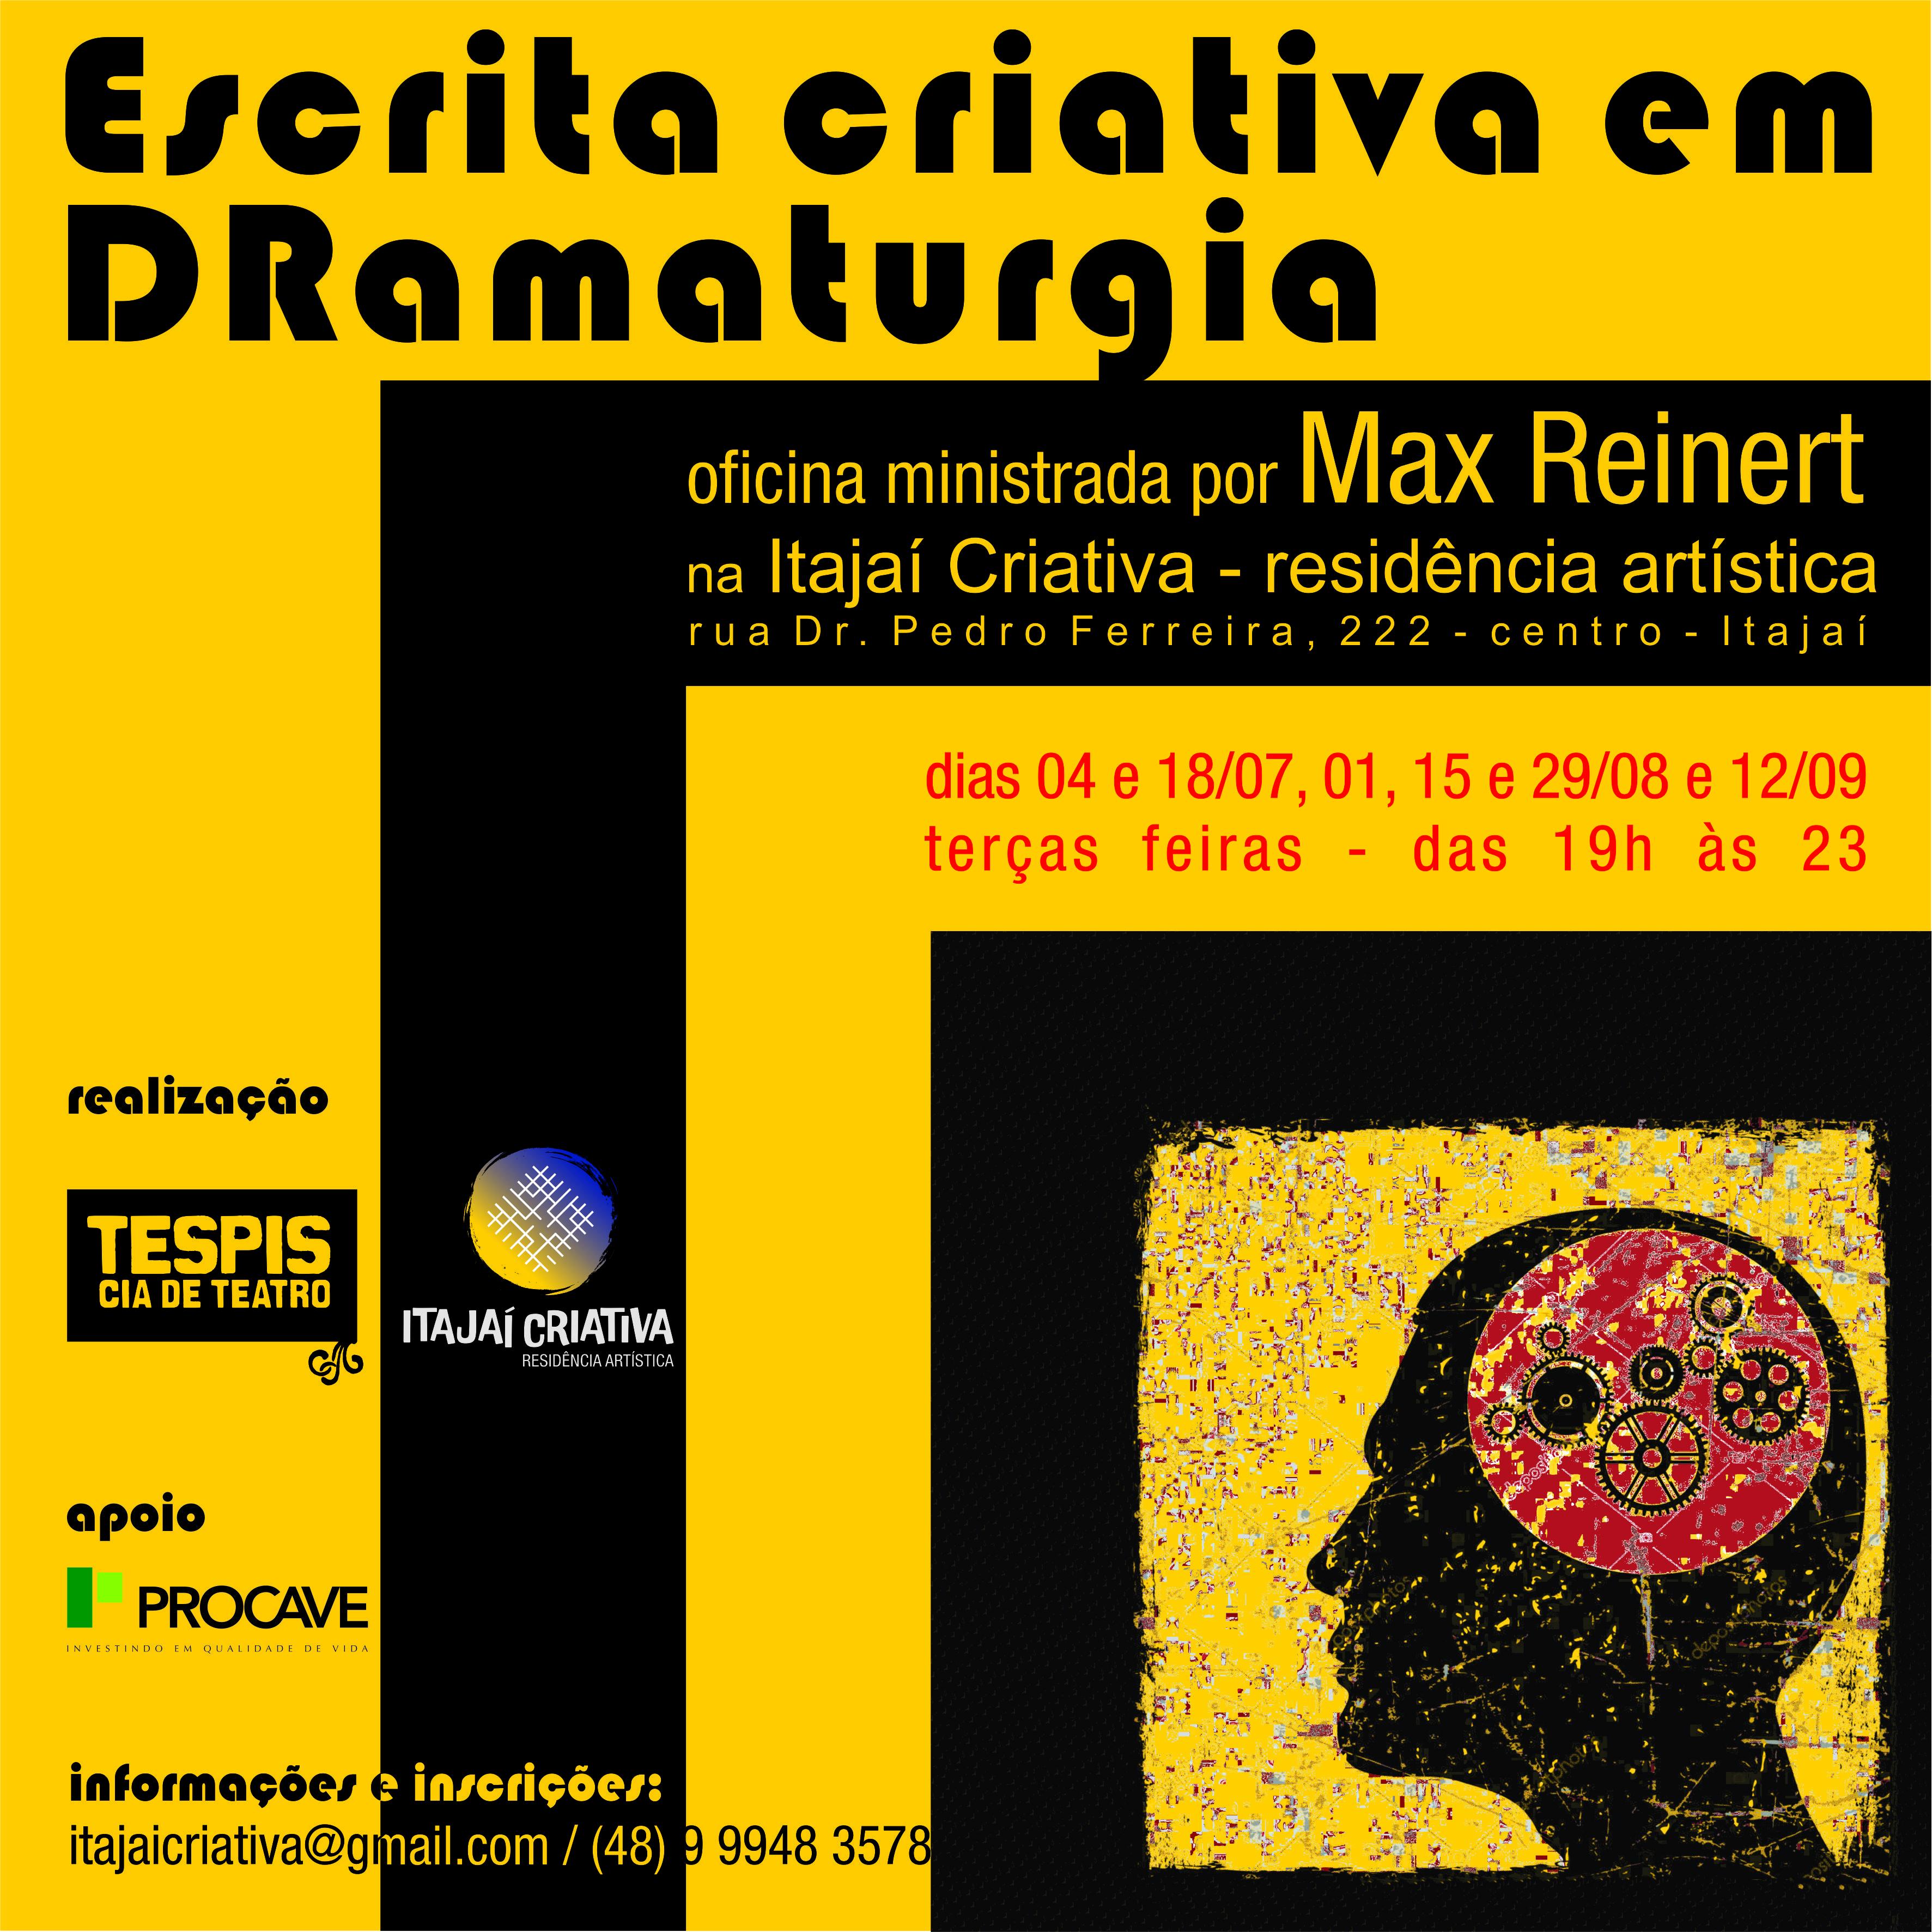 Oficina Escrita Criativa em Dramaturgia @ Itajaí Criativa - residência artística | Santa Catarina | Brasil